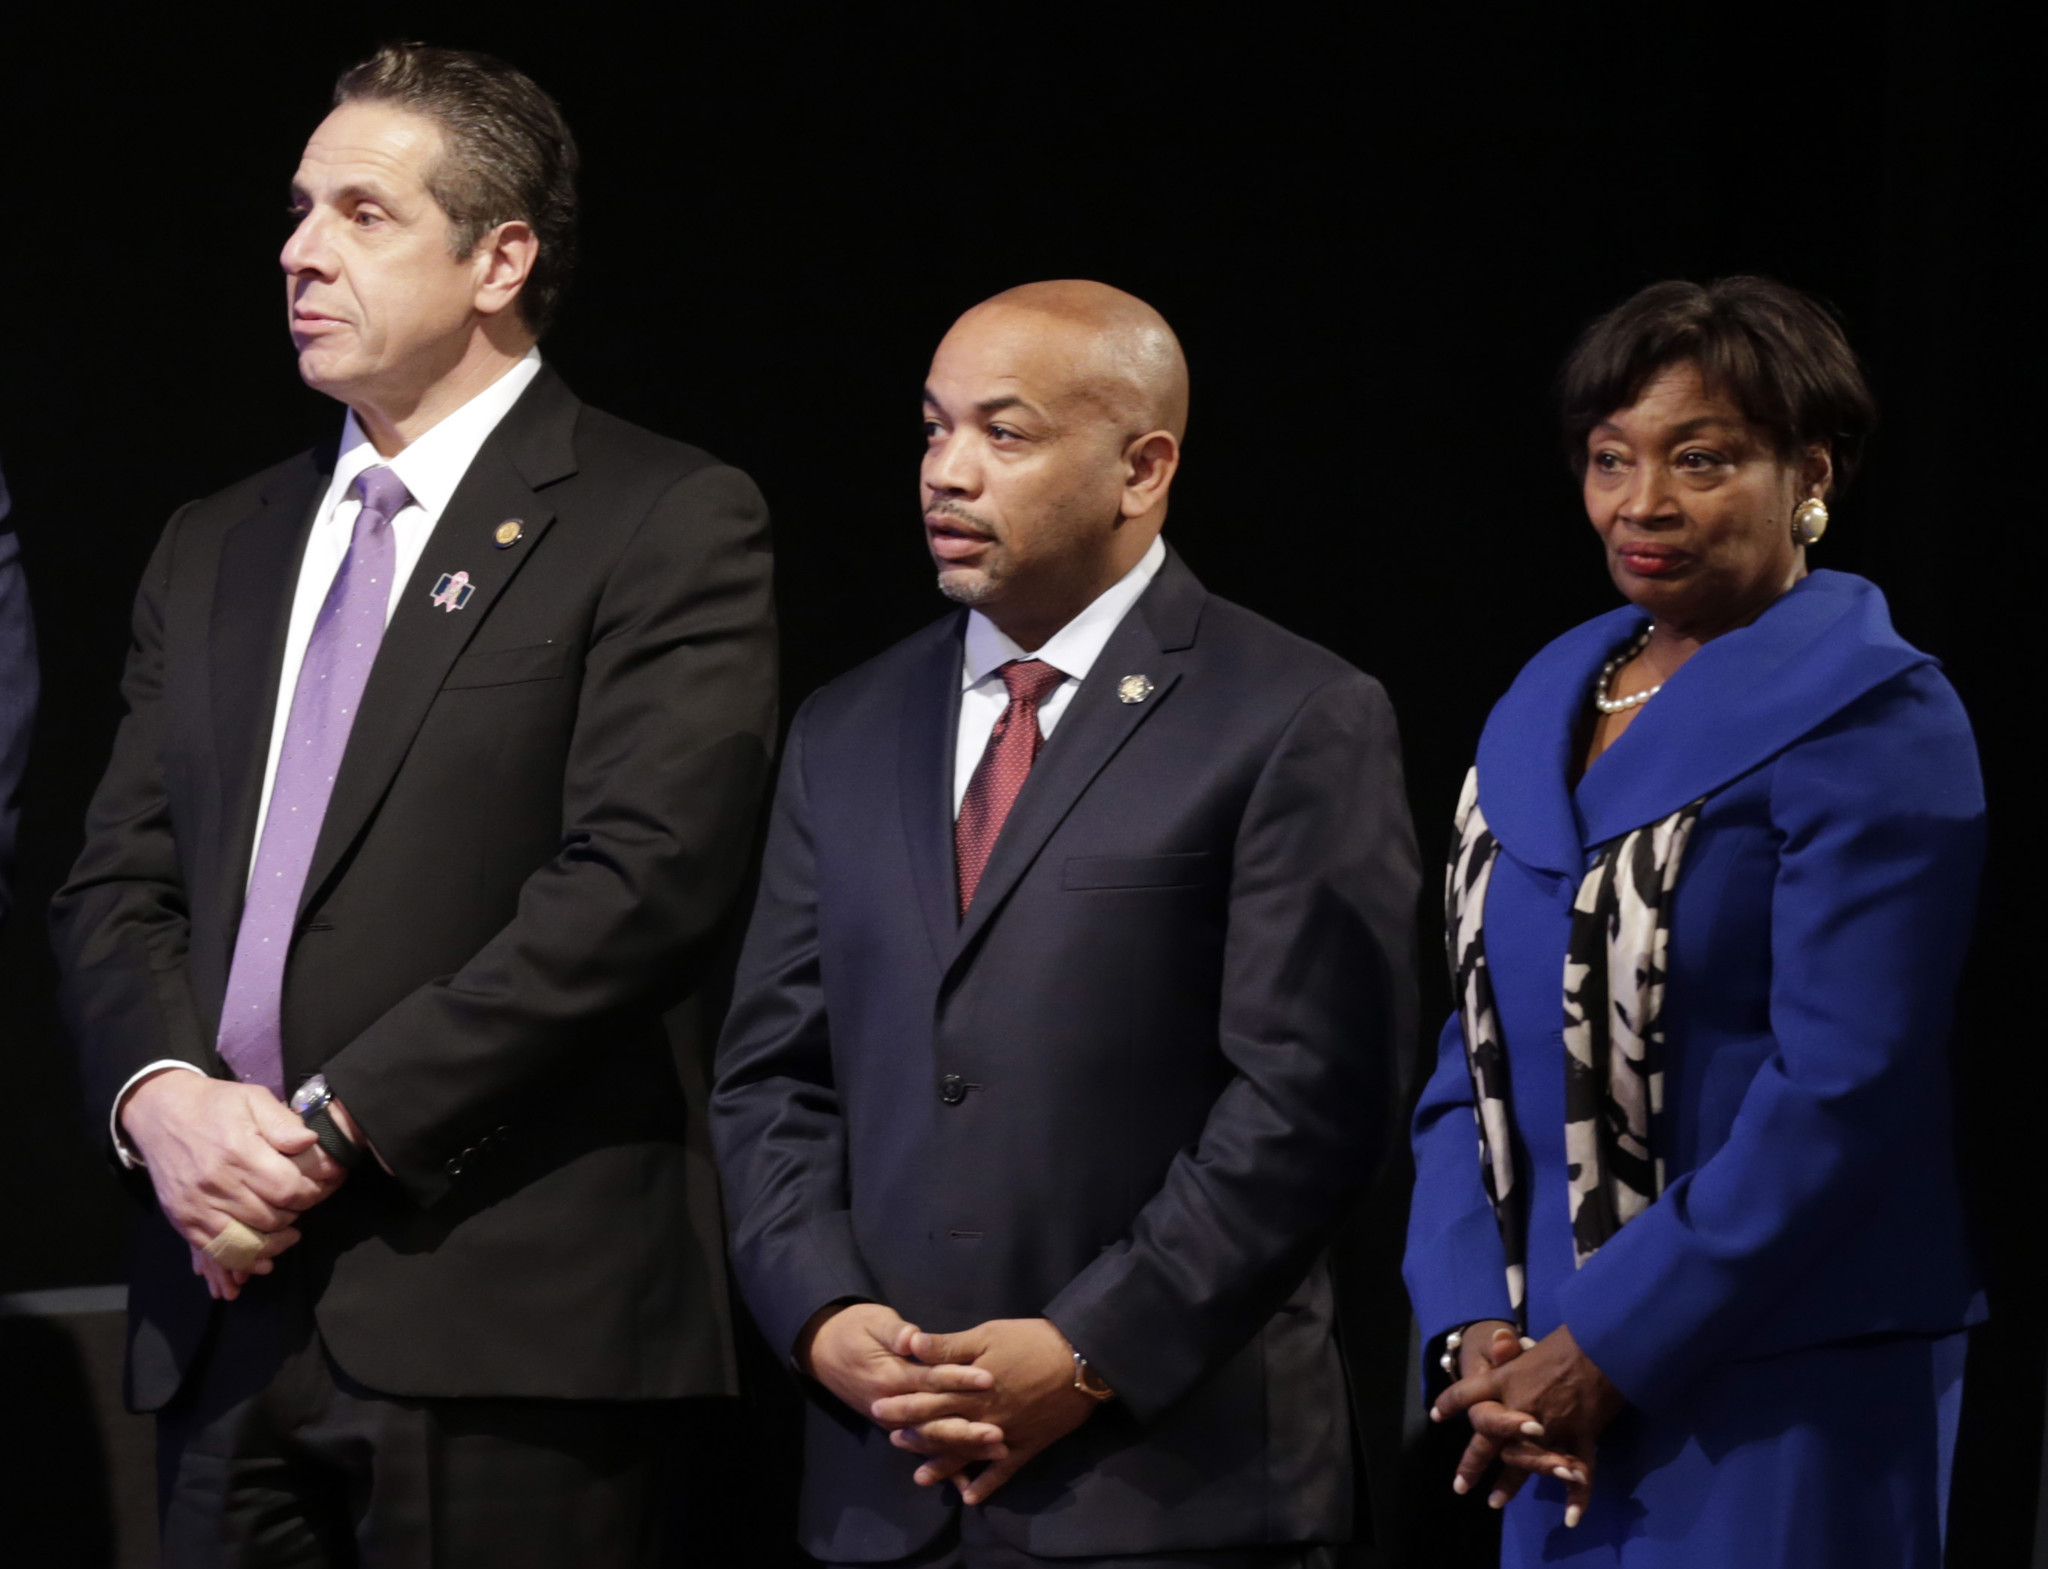 Cuomo and N.Y. legislature reach 'conceptual agreement' on budget